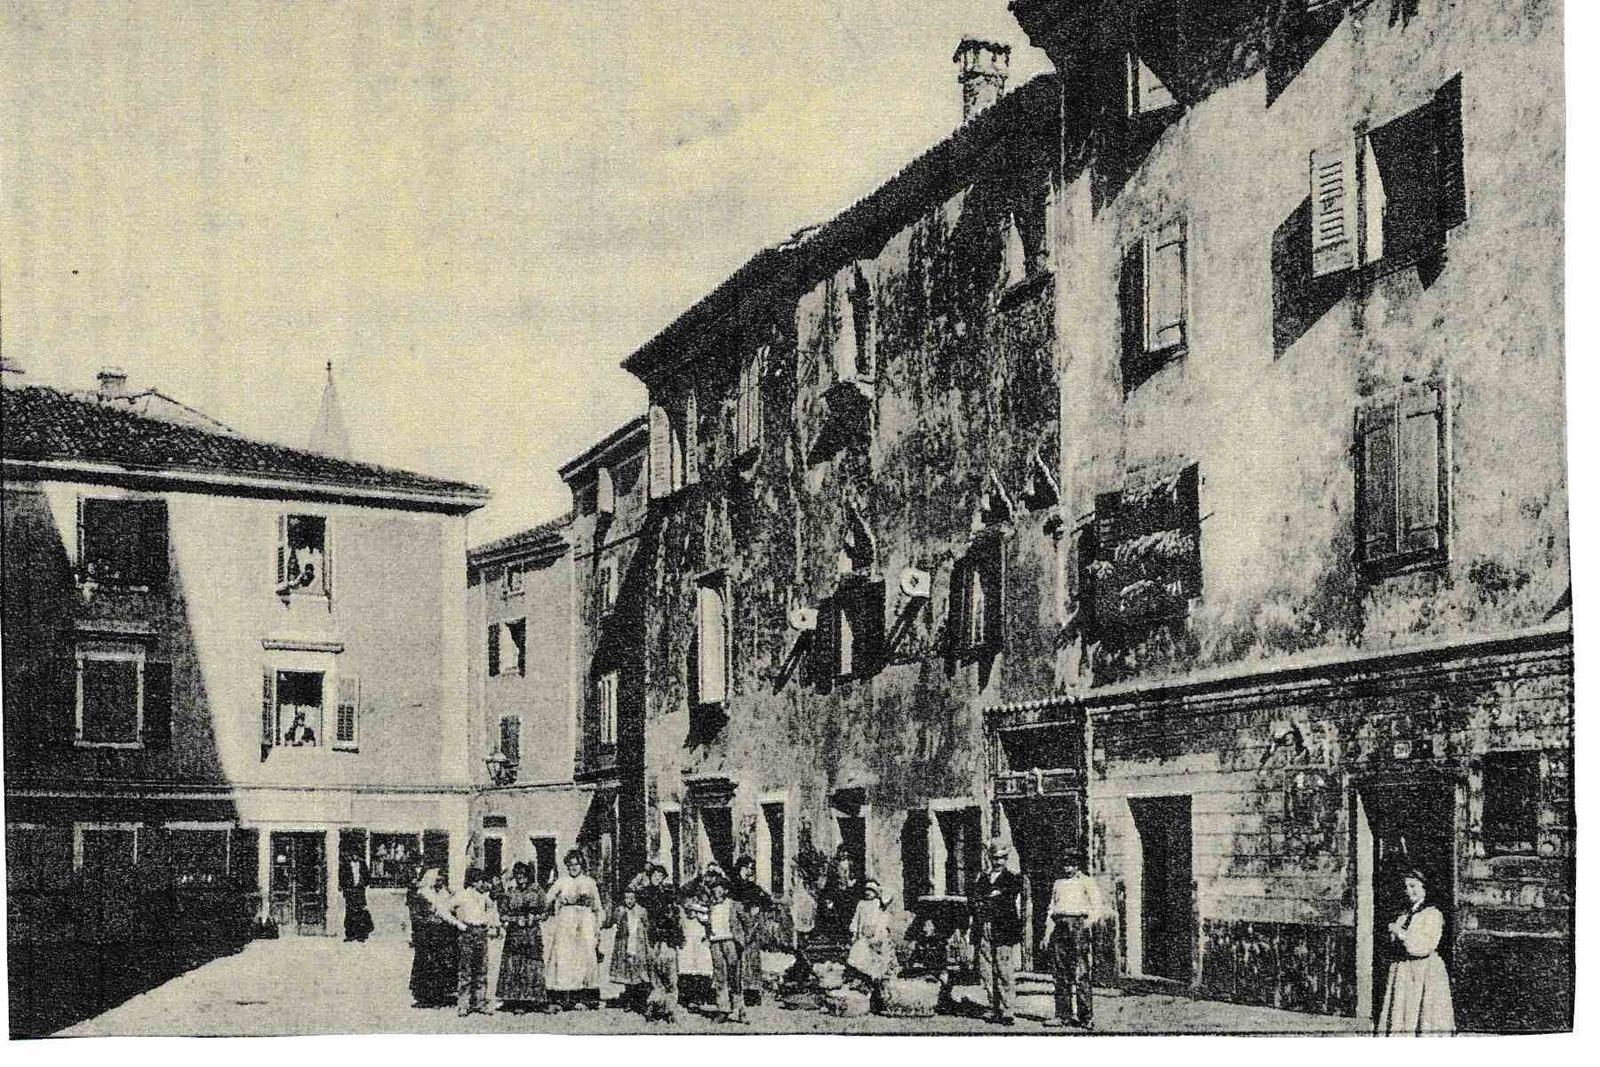 Izola -  Cartolina di Isola d'Istria - Casa antica veneziana Manzioli